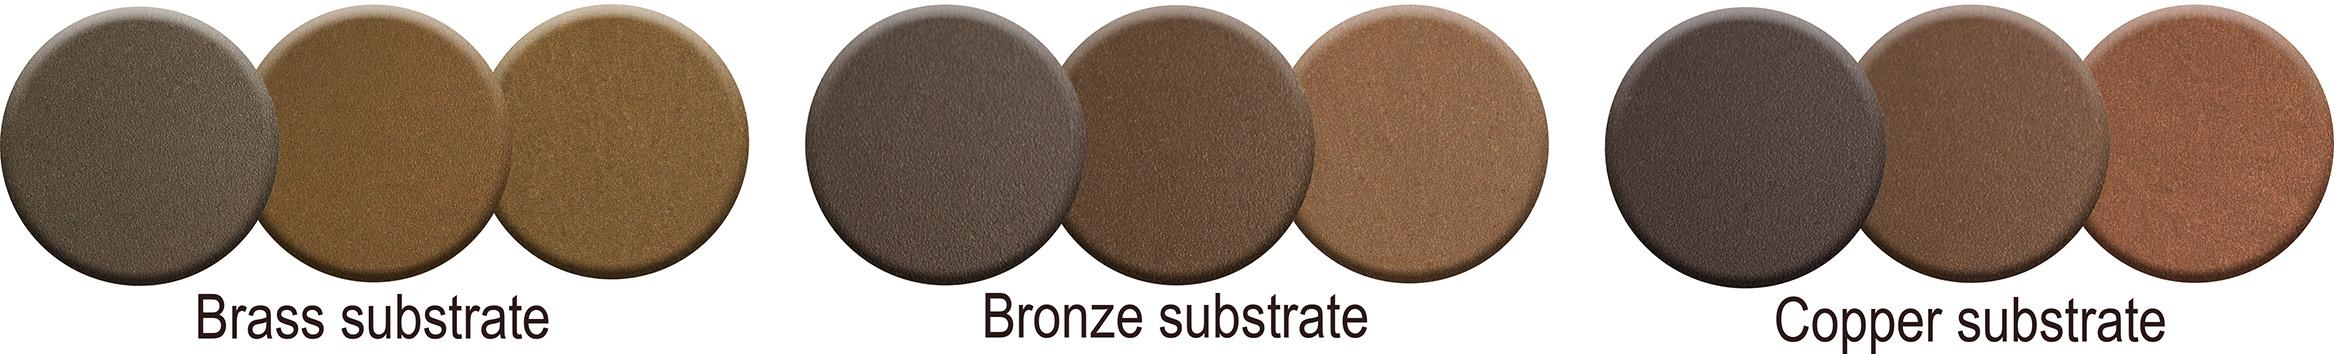 Brass substrate_1.jpg